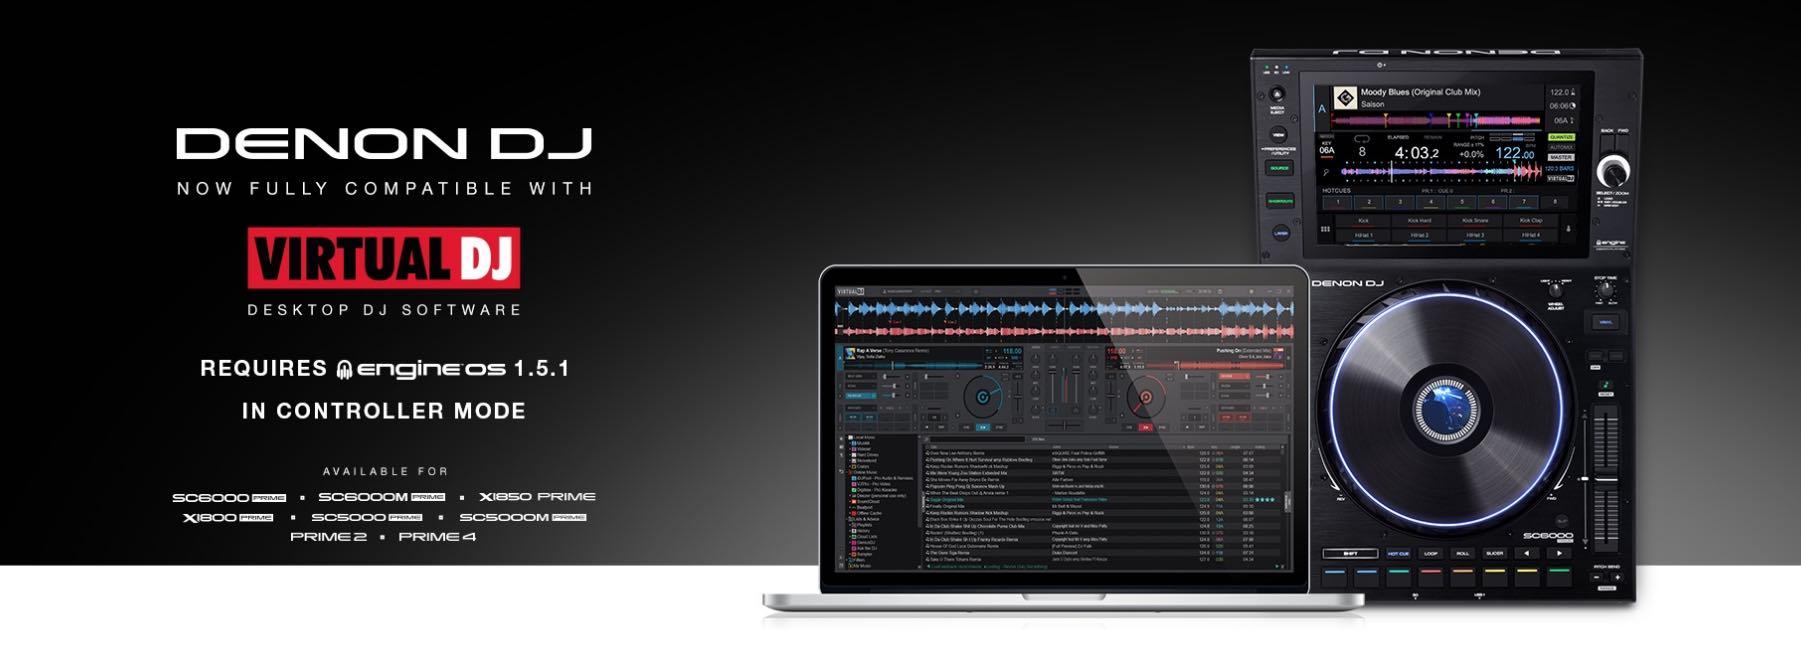 Denon DJ virtual software hardware player performance live strumenti musicali